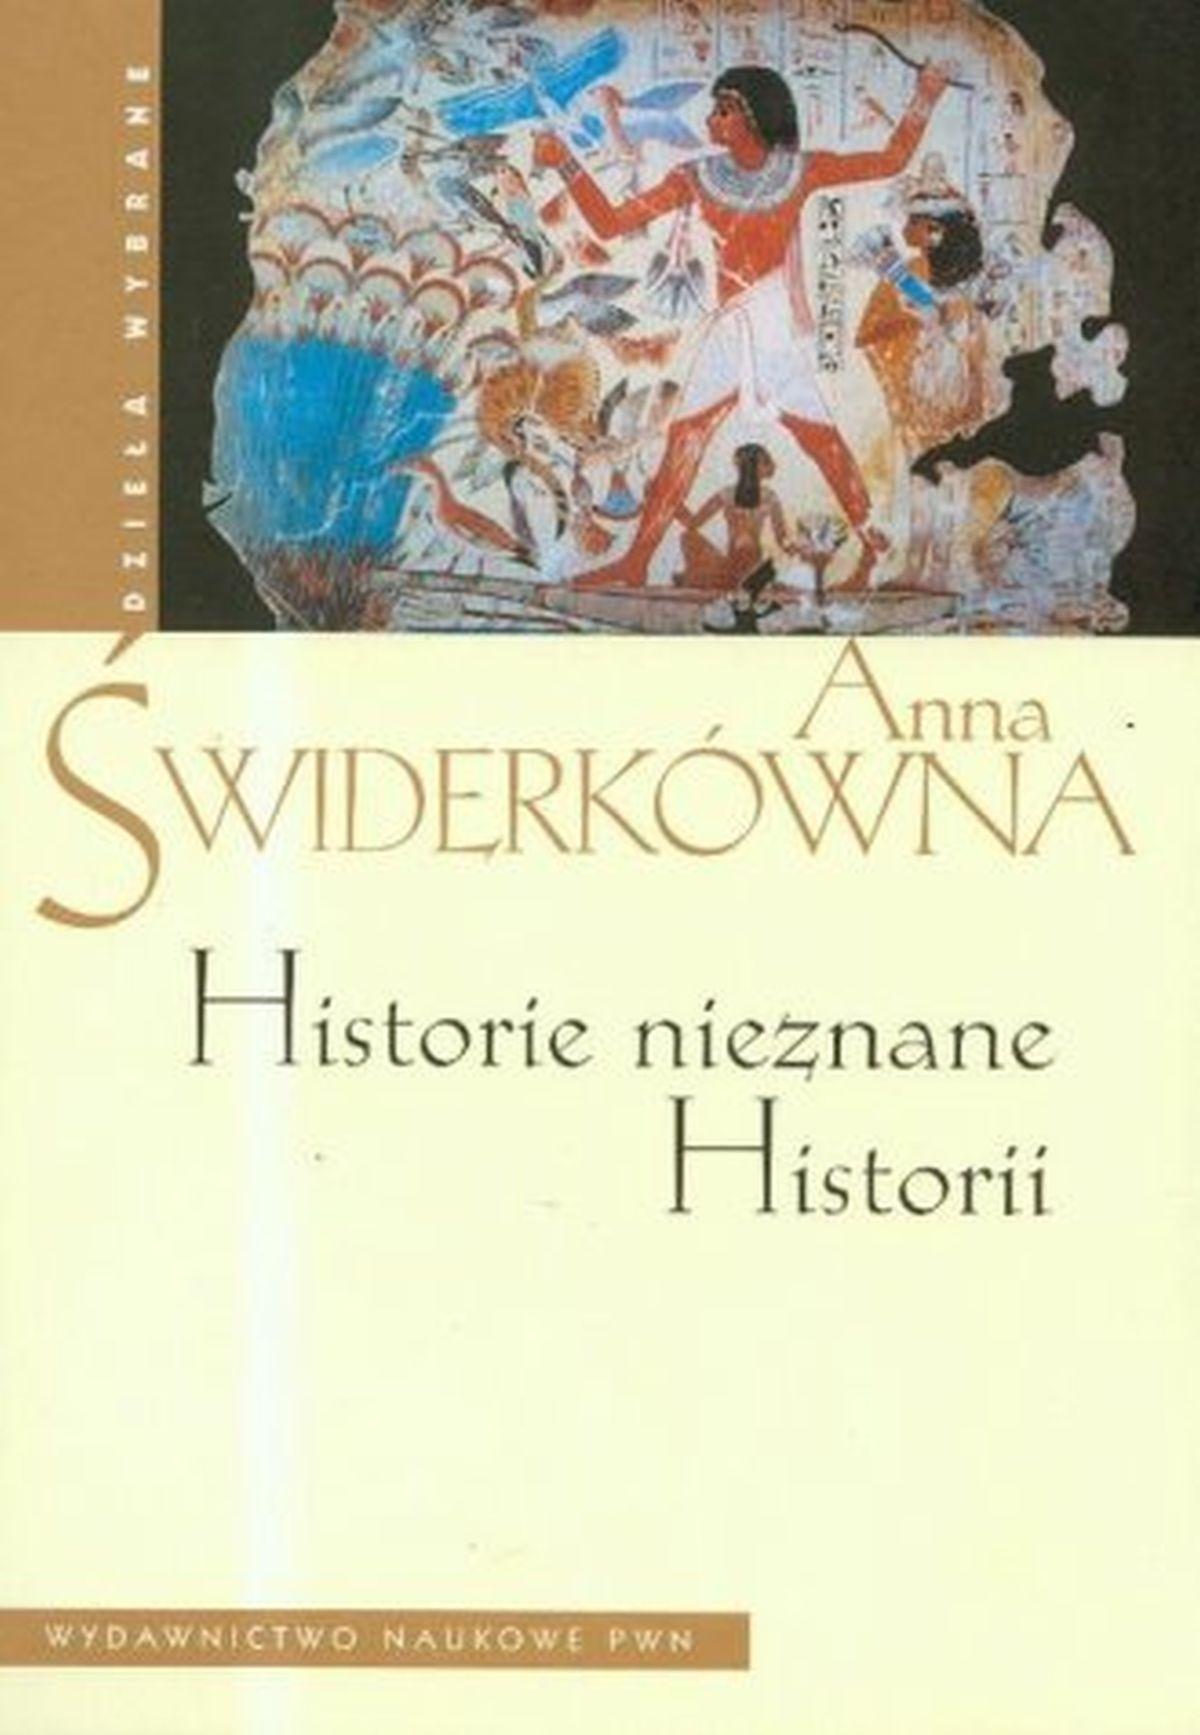 Historie nieznane Historii